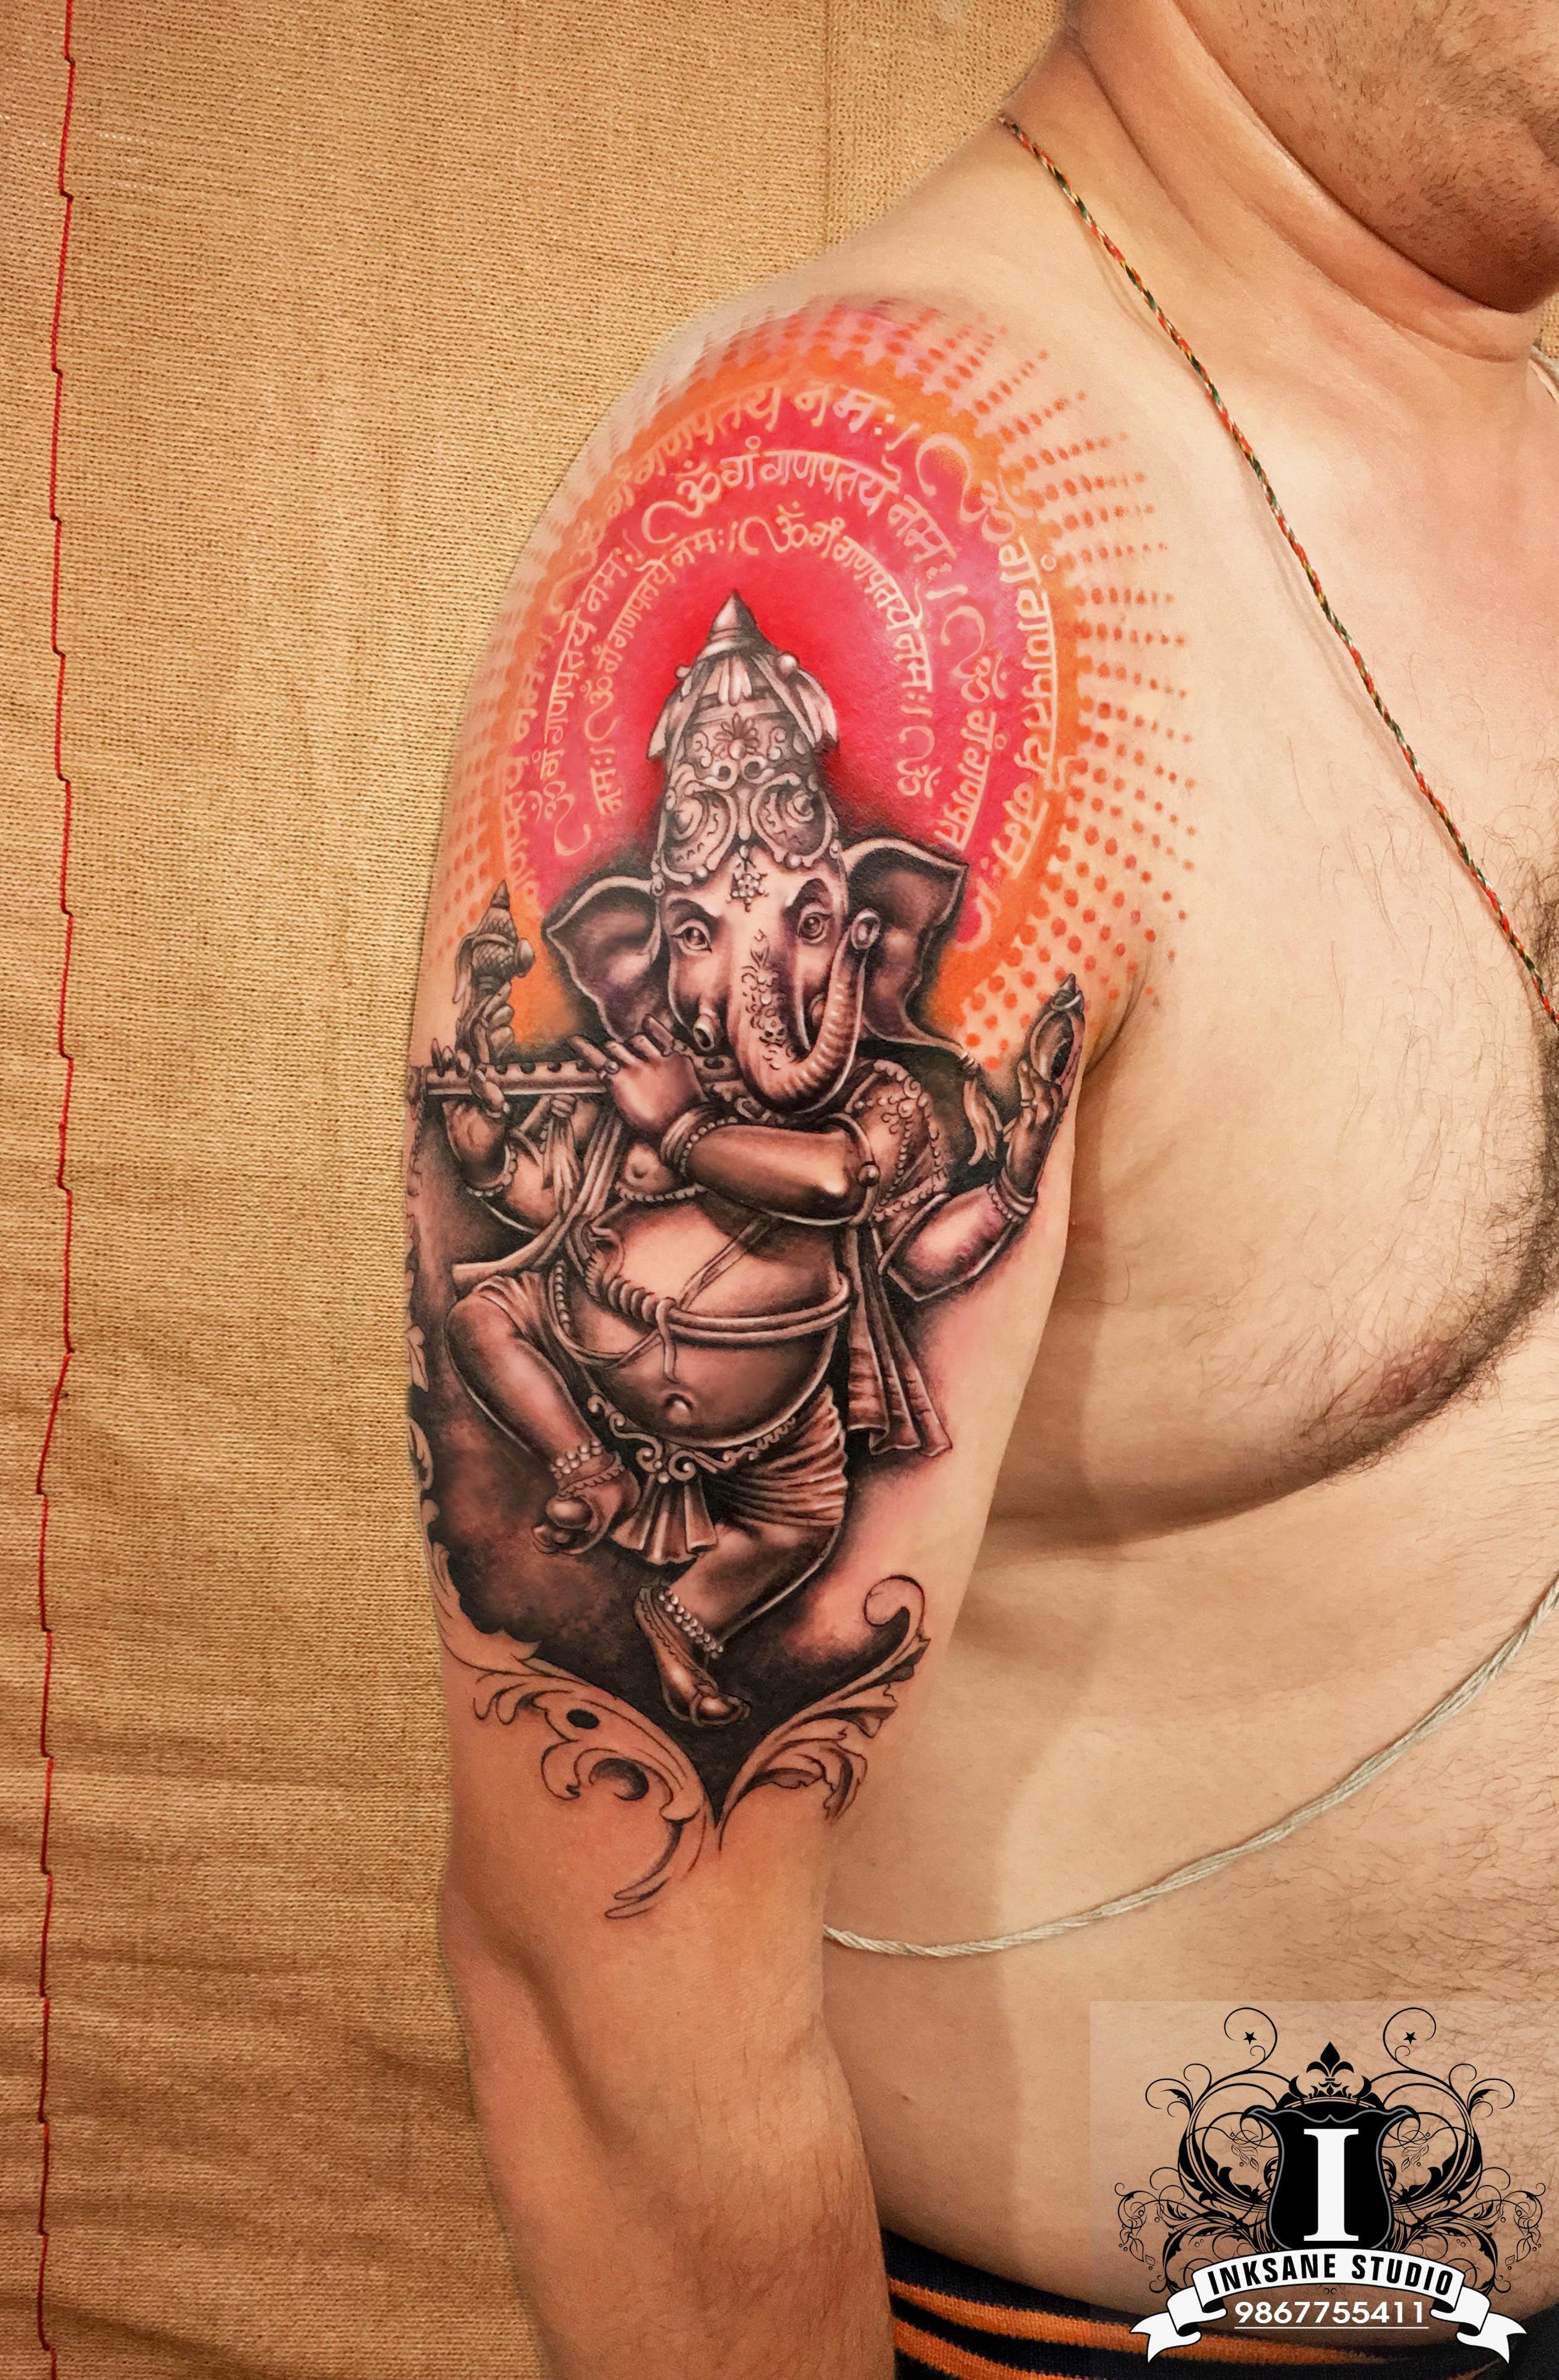 11 ganesha tattoo designs ideas and samples -  Ganesha Lordganesh Ganapati Ornamental Religious Hindugod God Tattoo